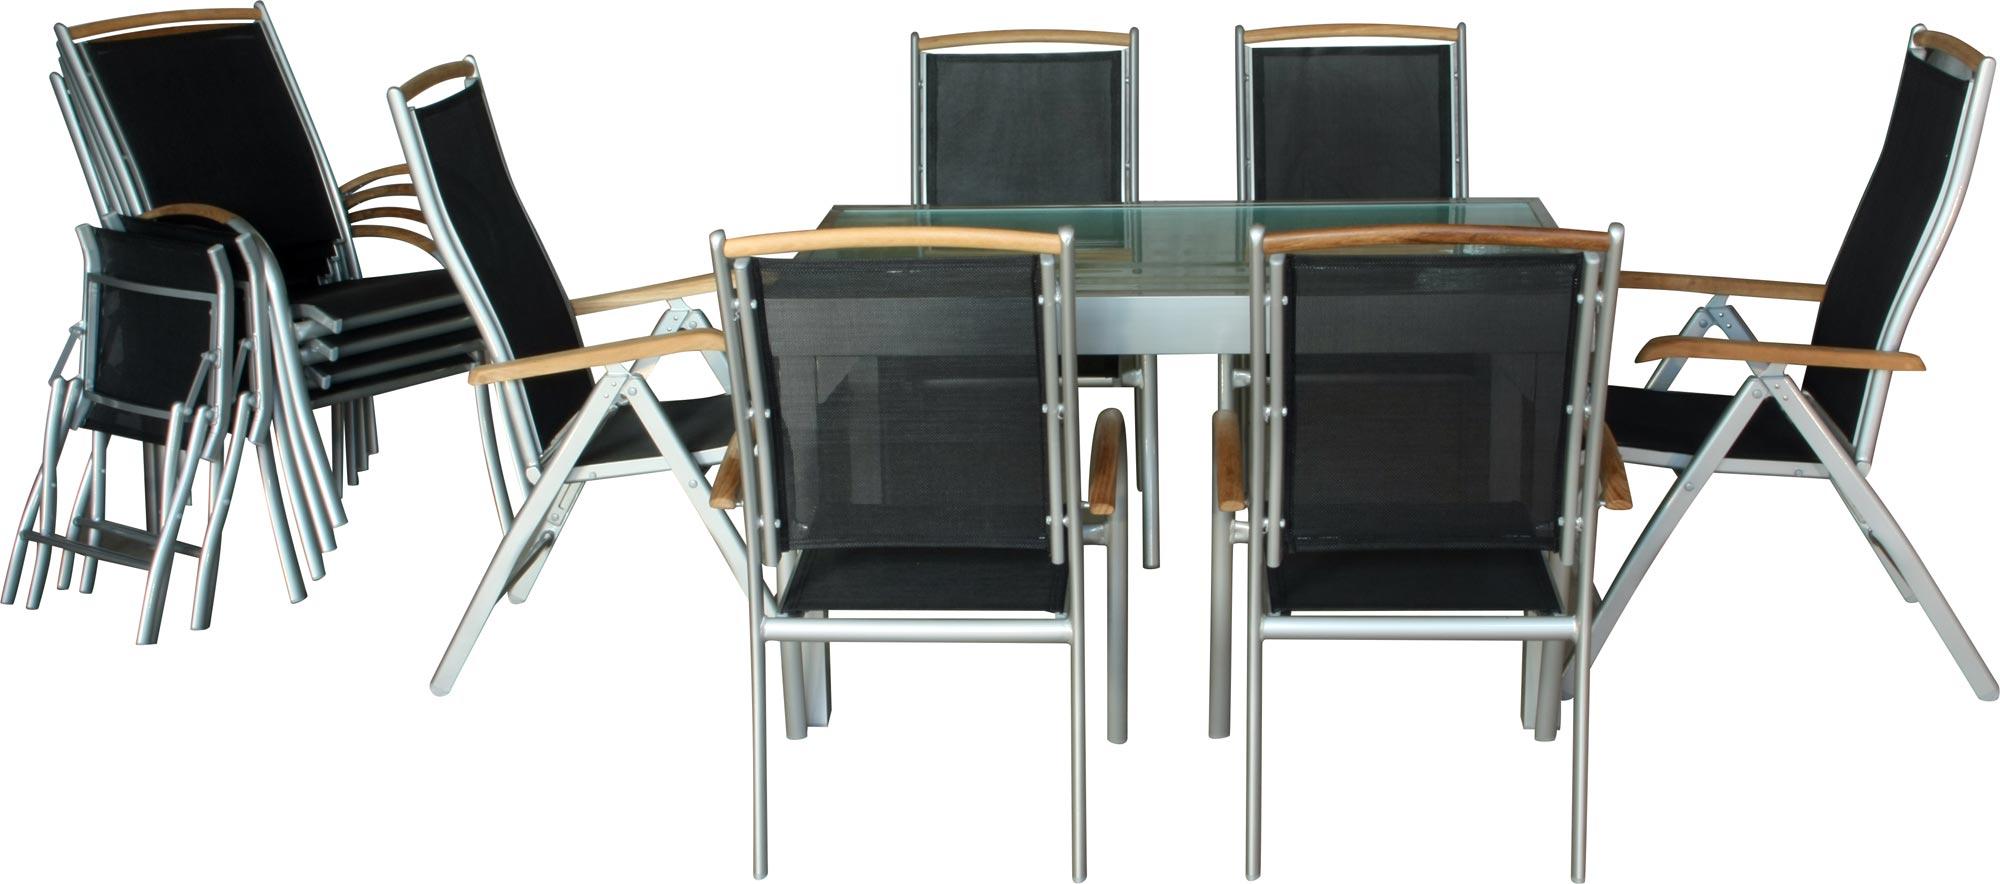 ib style diplomat xxl salon de jardin alu 13pcs i table 135 270 i argent teck ebay. Black Bedroom Furniture Sets. Home Design Ideas